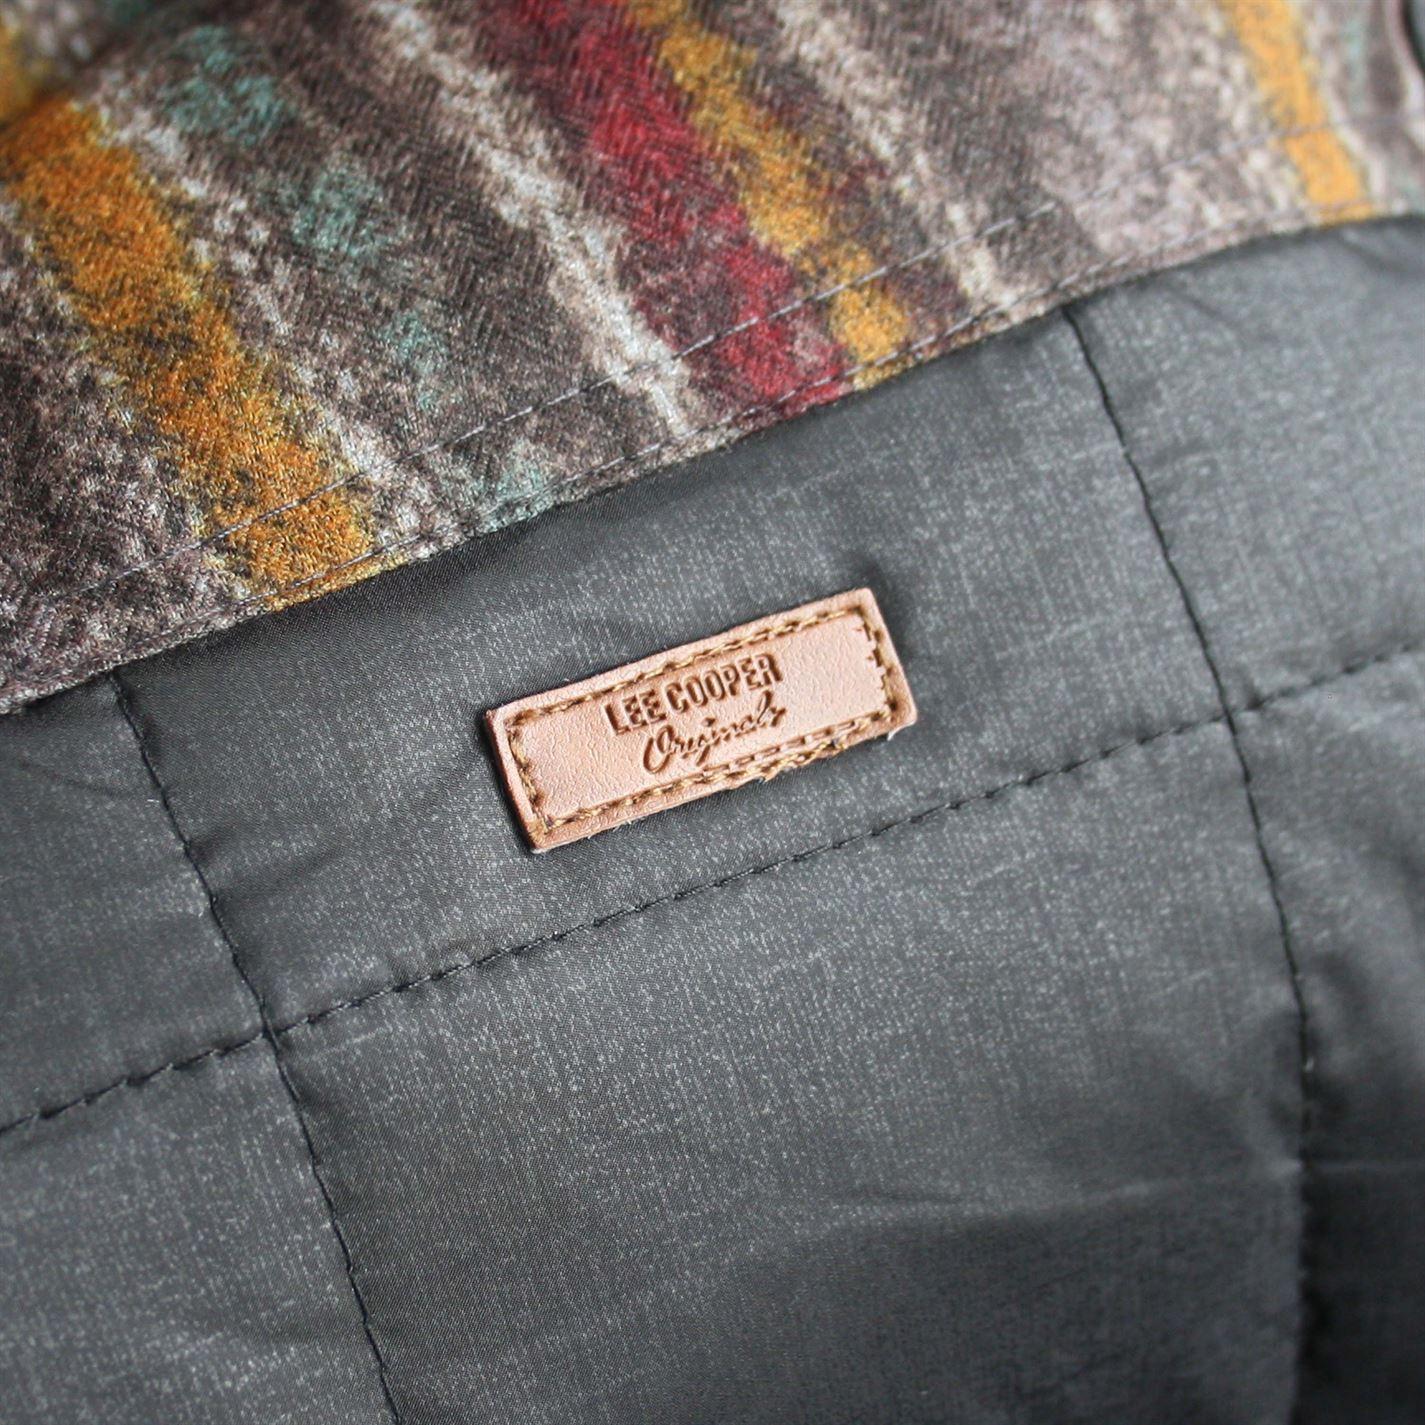 Lee Cooper Knit Hooded Down Jacket Mens Gents Coat Top Zip Zipped ... 4ddee4b907